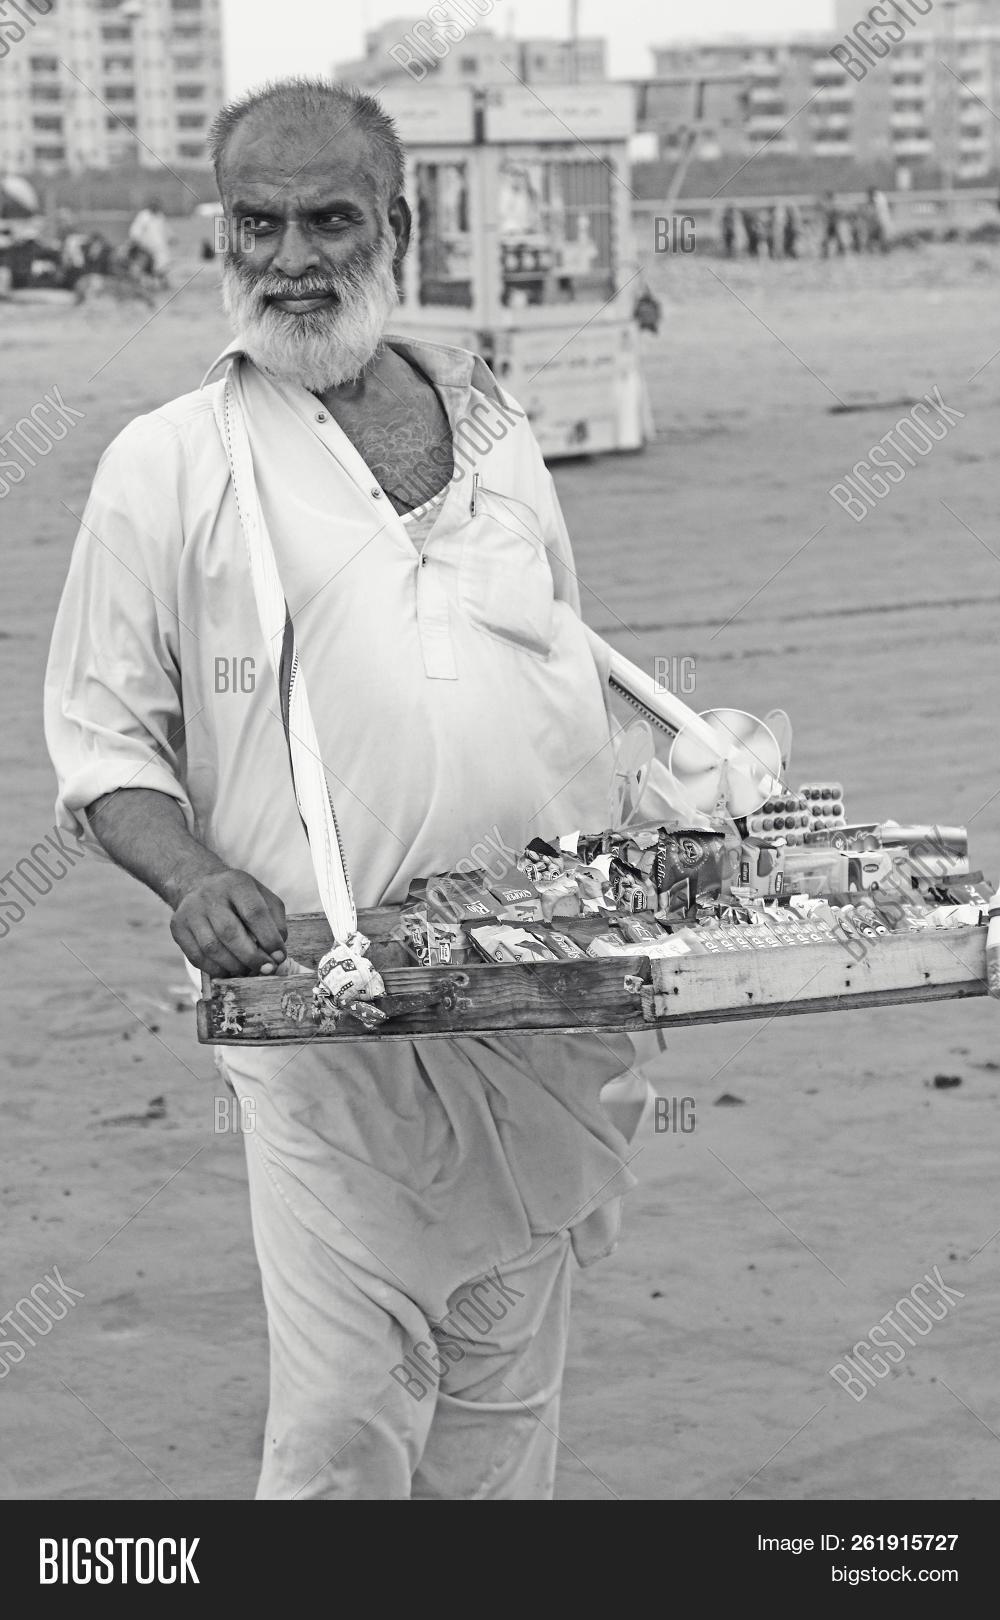 Portrait - Old Man Image & Photo (Free Trial) | Bigstock